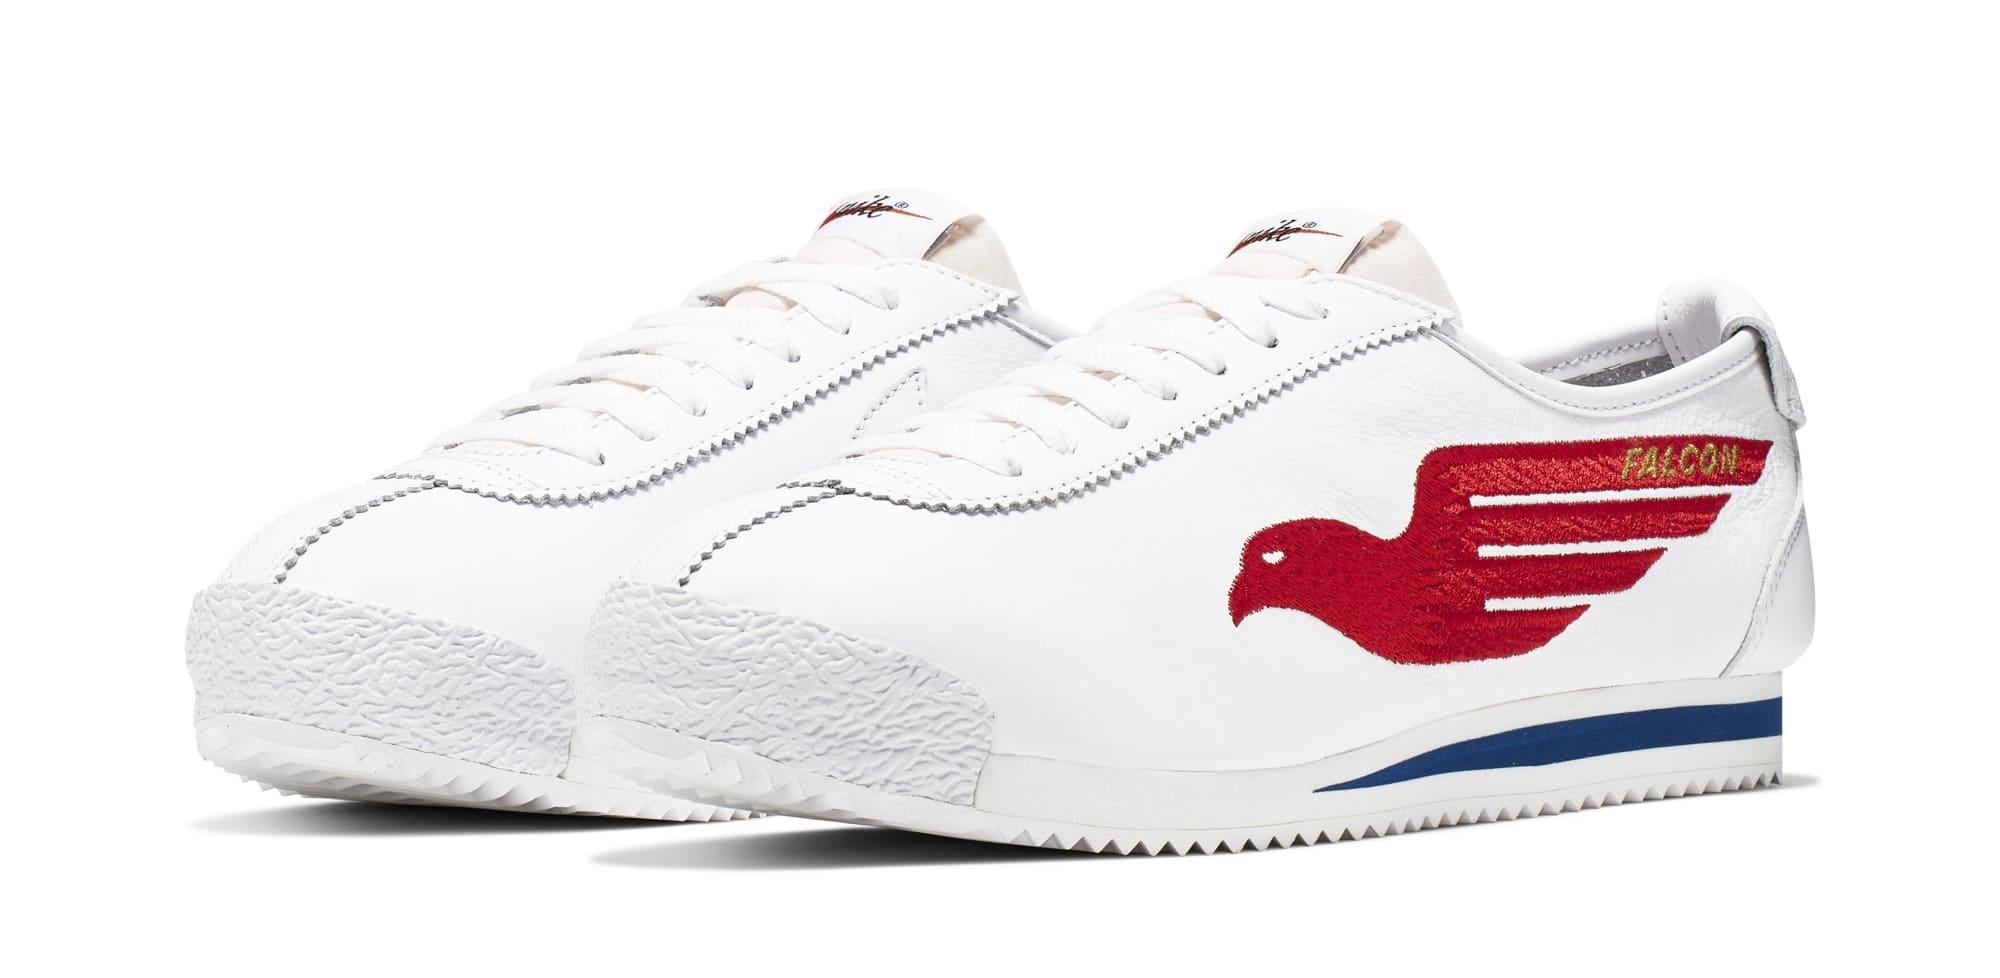 Nike Classic Cortez 'Shoe Dog Pack (Falcon)' CJ2586-101 (Pair)